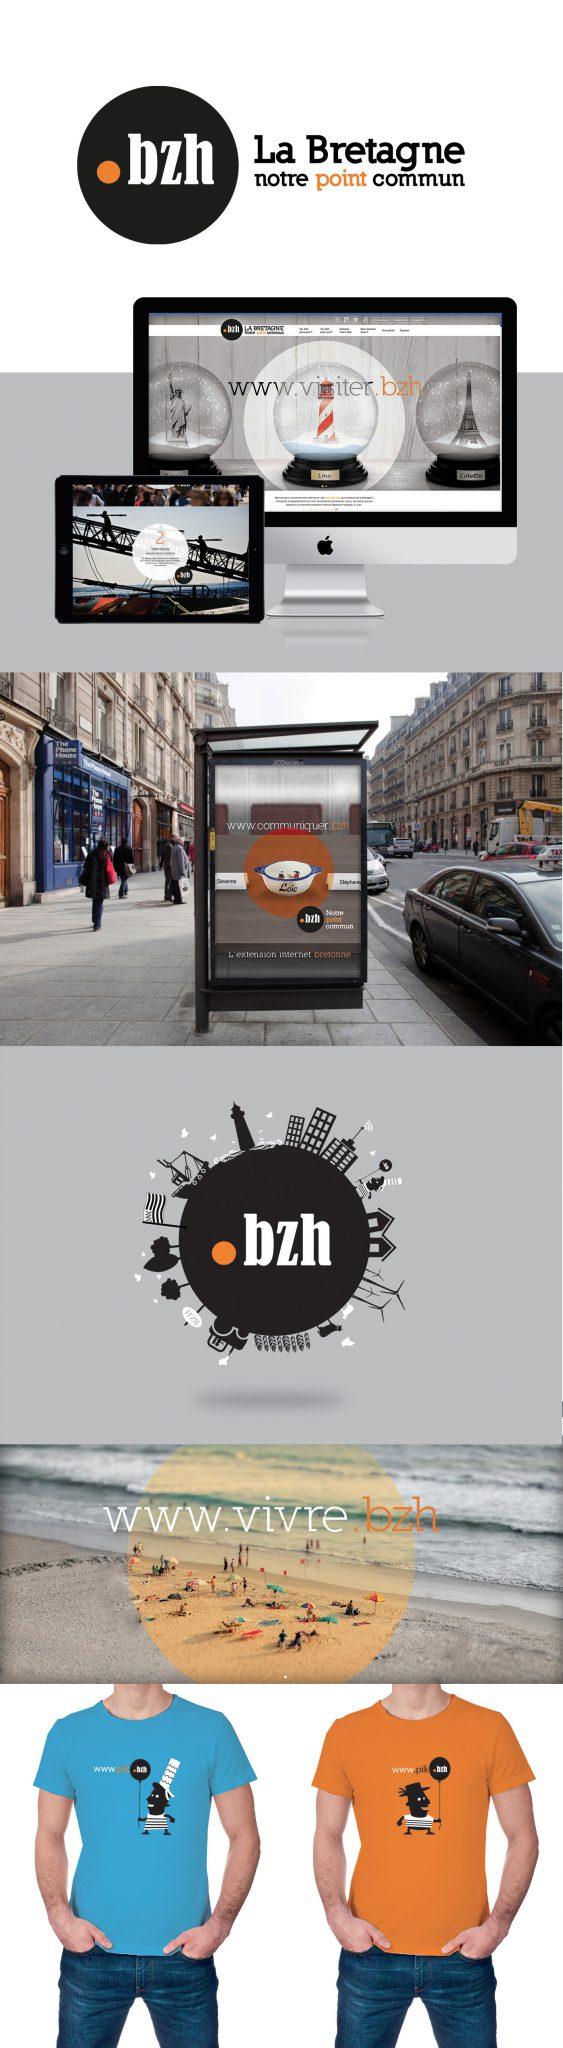 BZH-marketing-campagne-digital-commmunication-bretagne